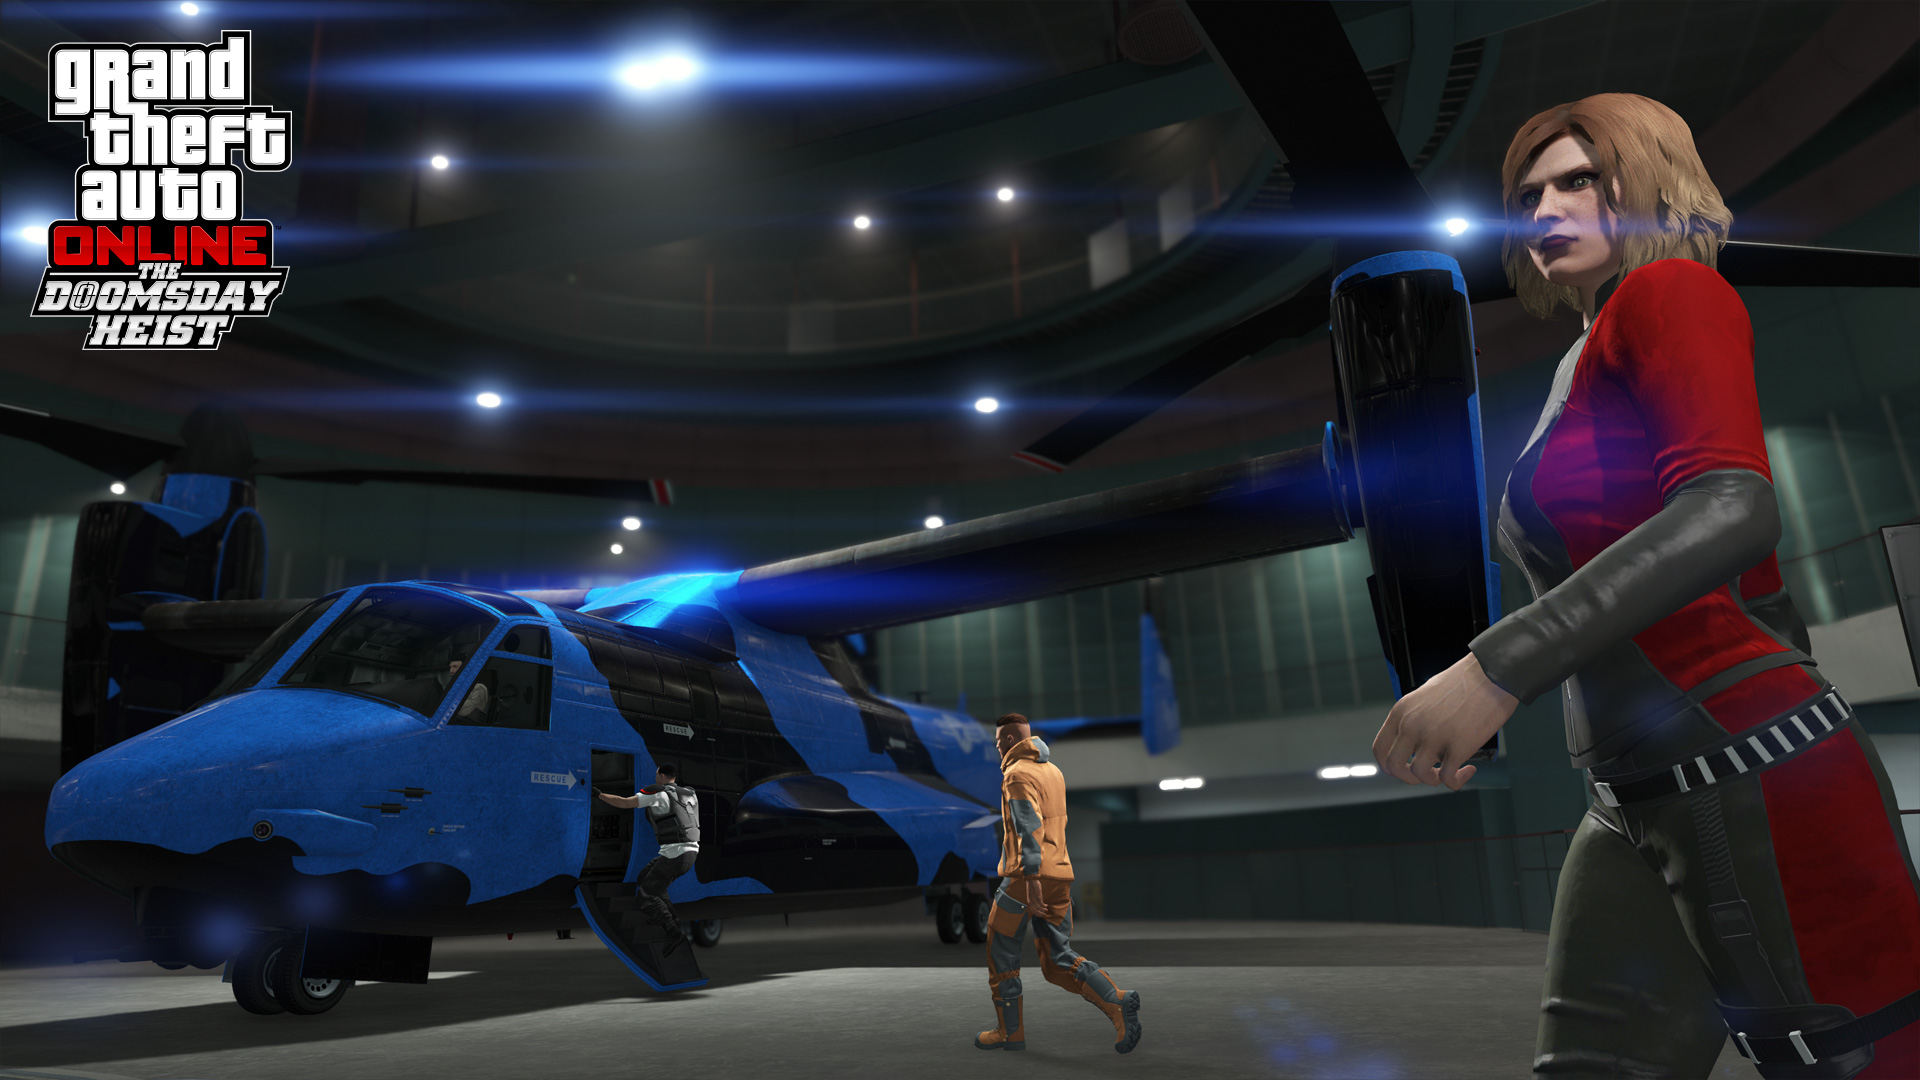 GTA5:外挂版(豪车 美女 飞机 大炮 最强修改器)插图3